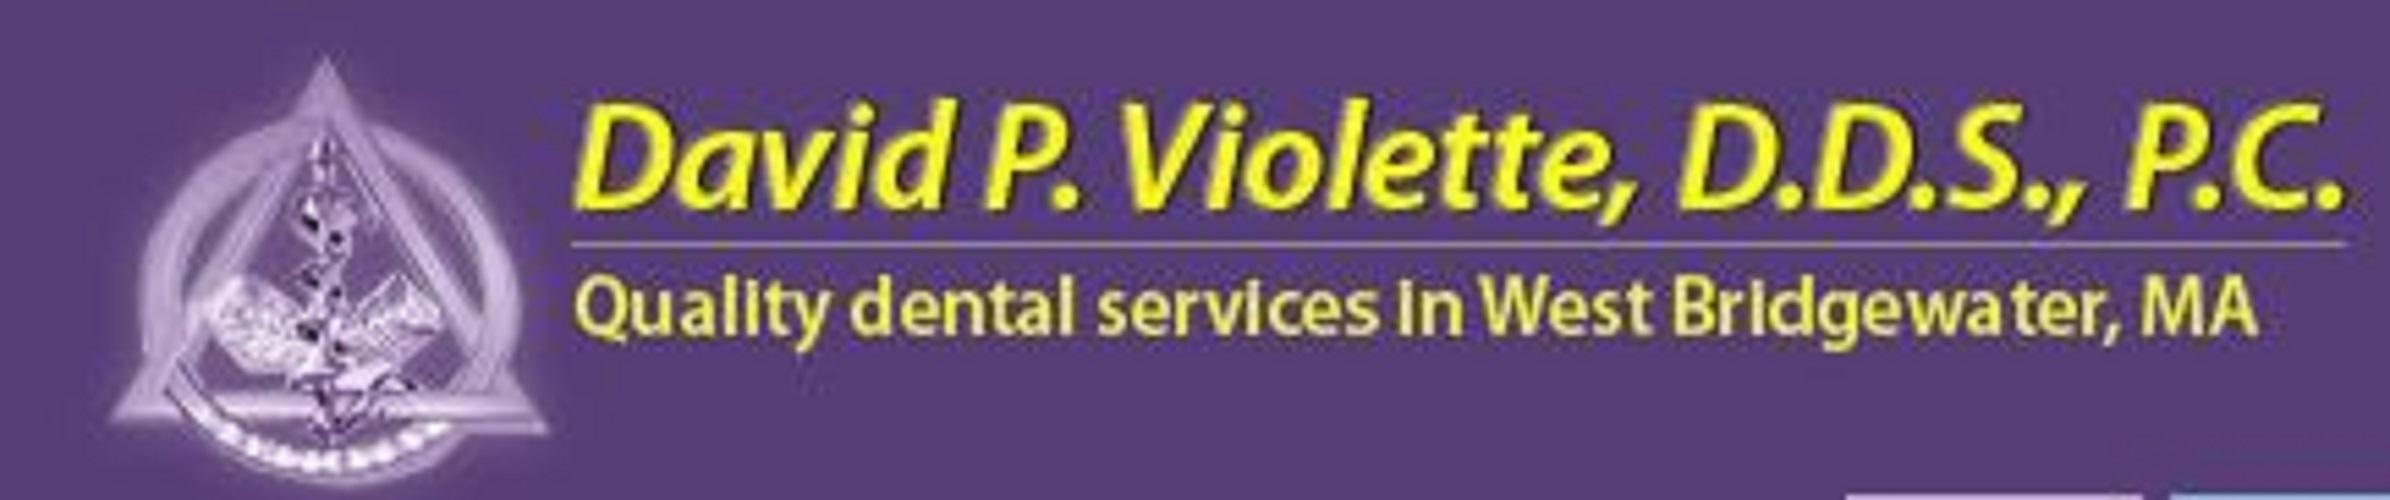 Dr. David P Violette